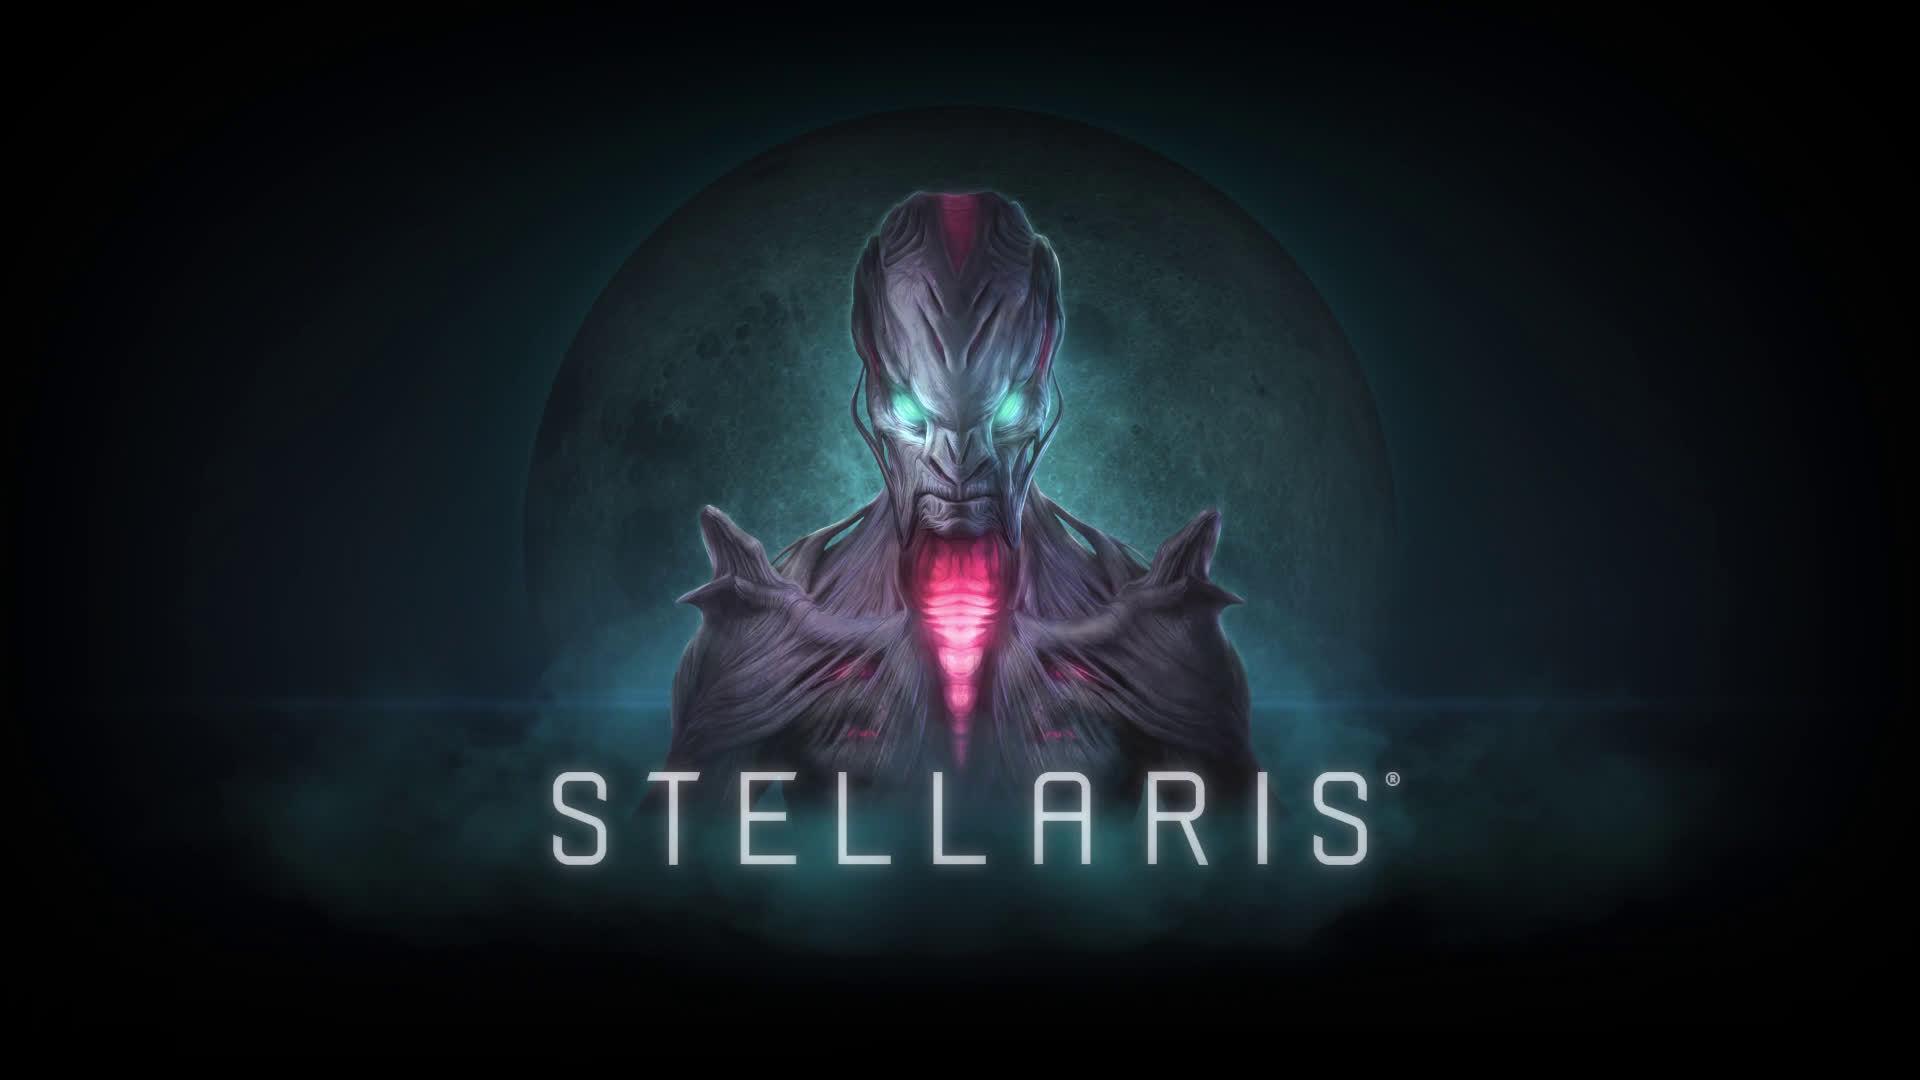 P社太空策略模拟游戏《群星》新DLC《死灵物种包》